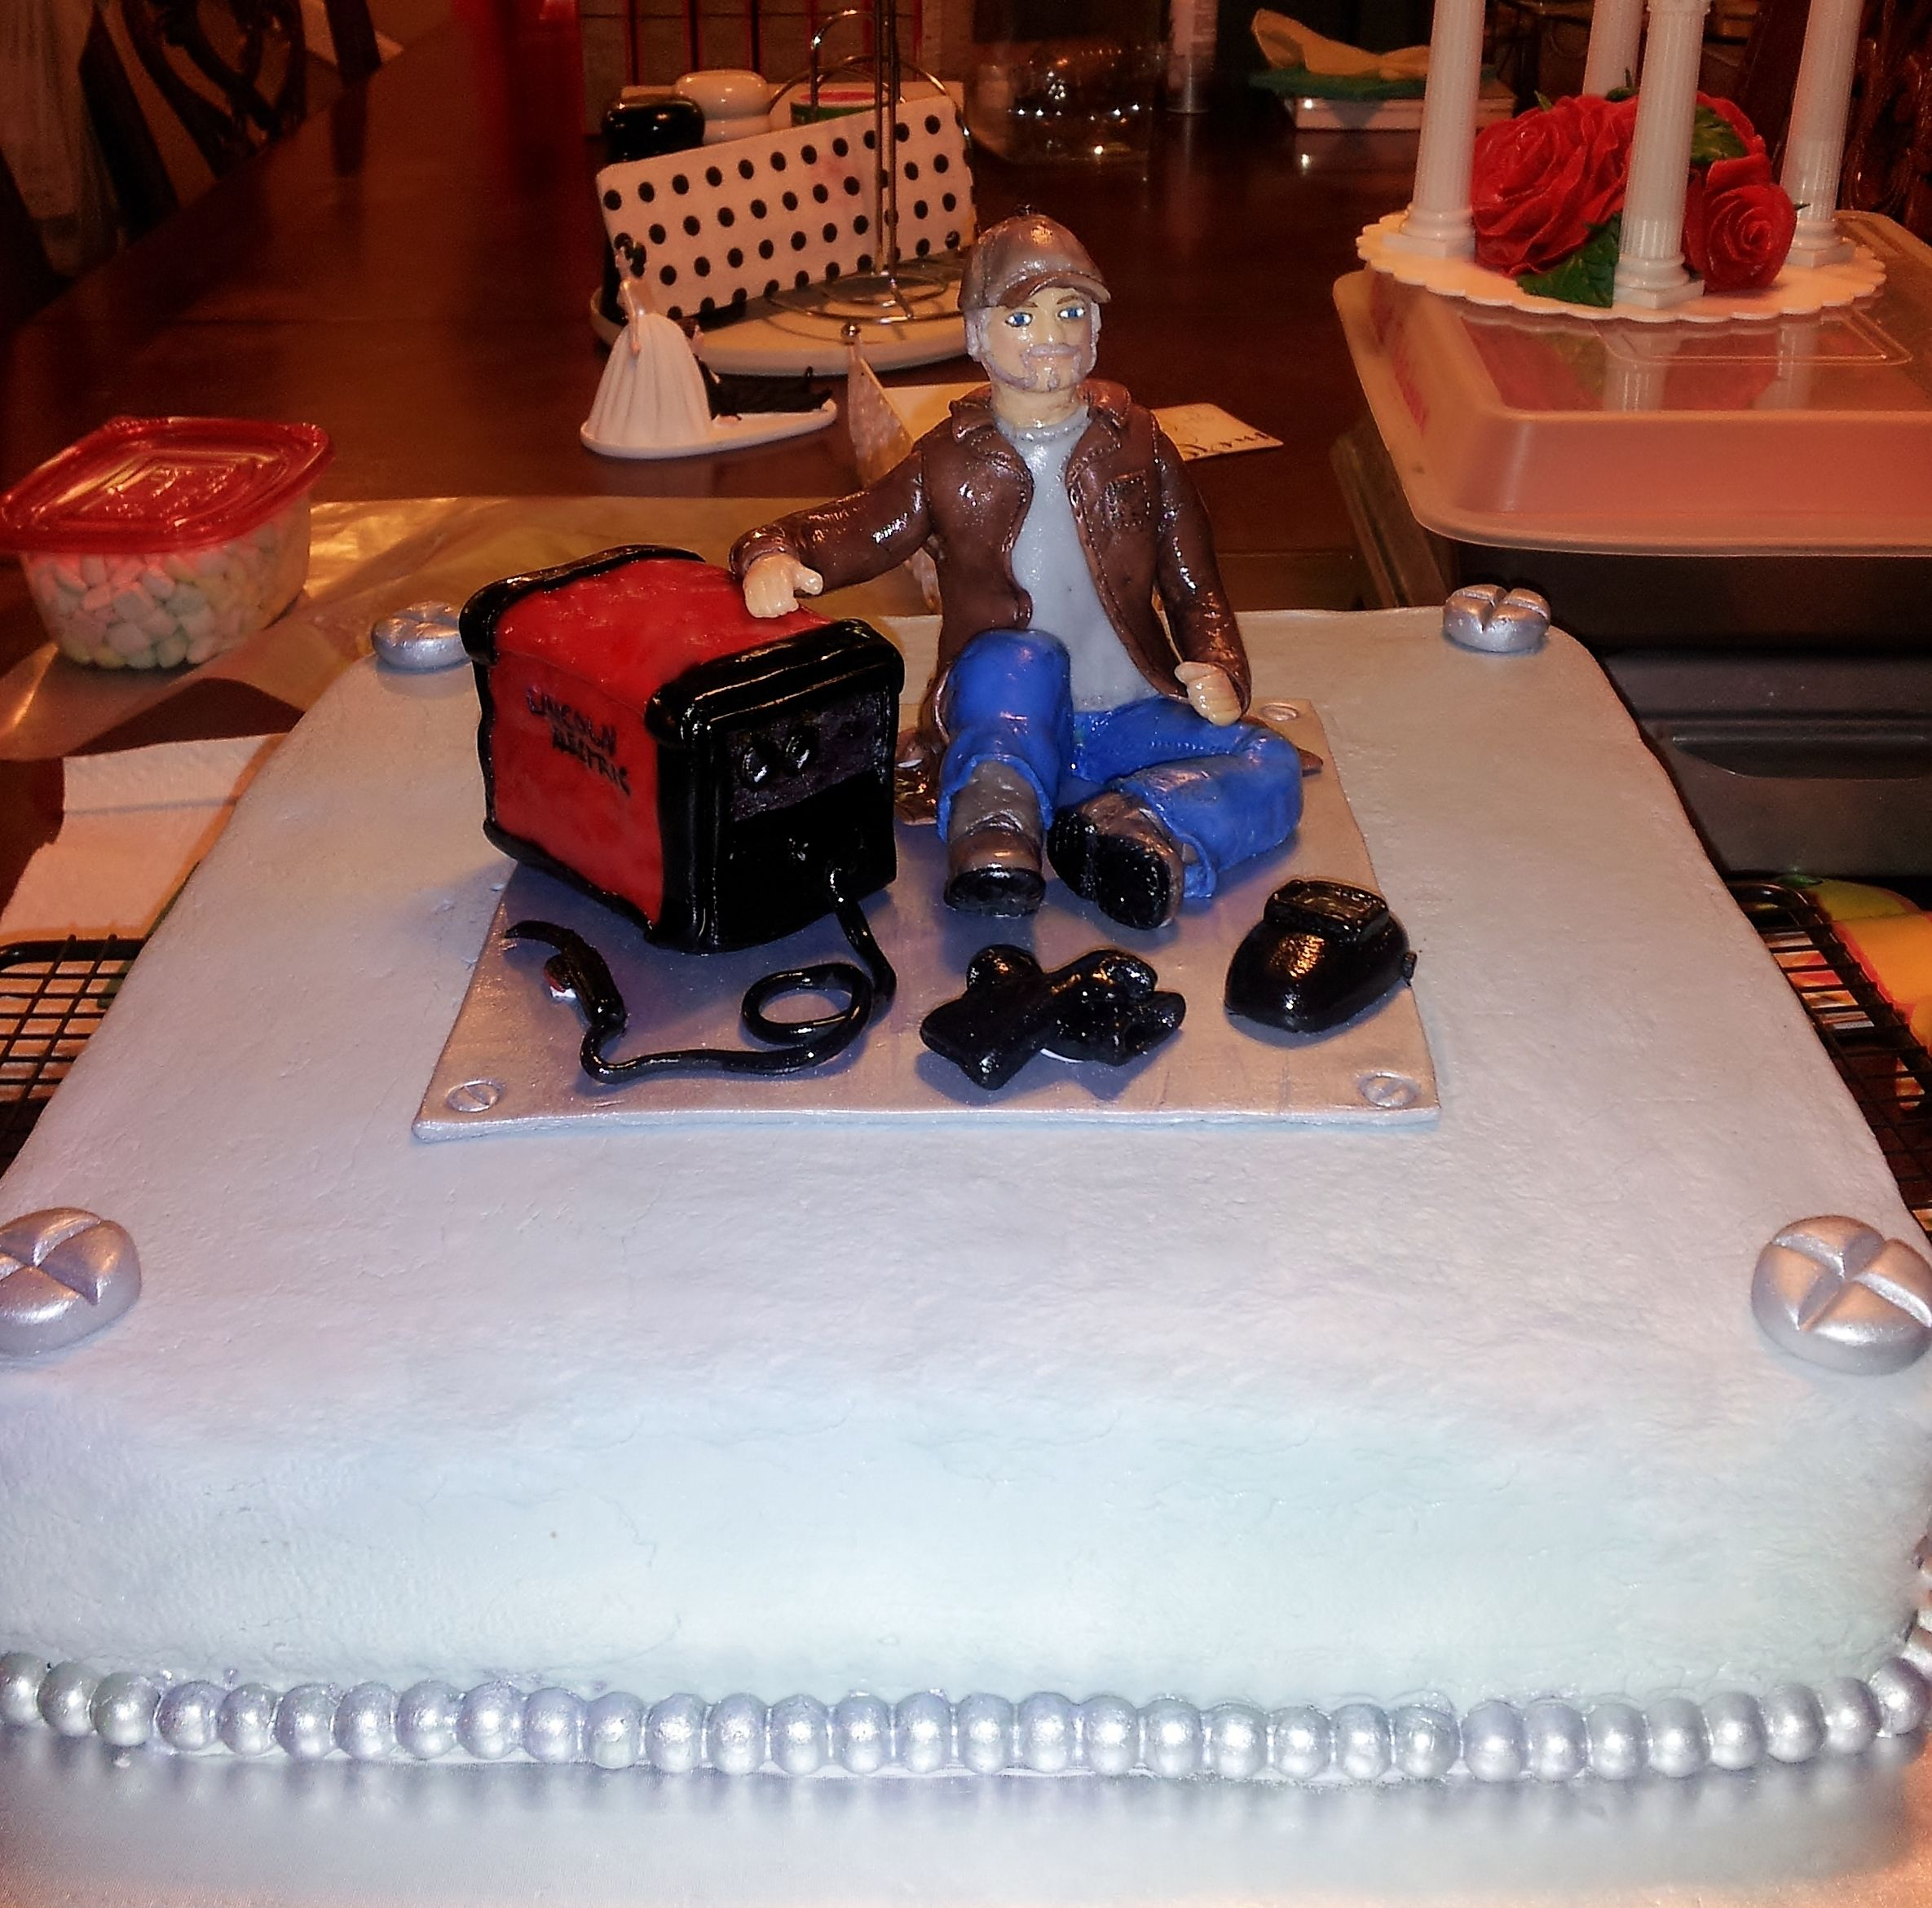 Welding Grooms Cake Cake Decorating Birthdays Projects